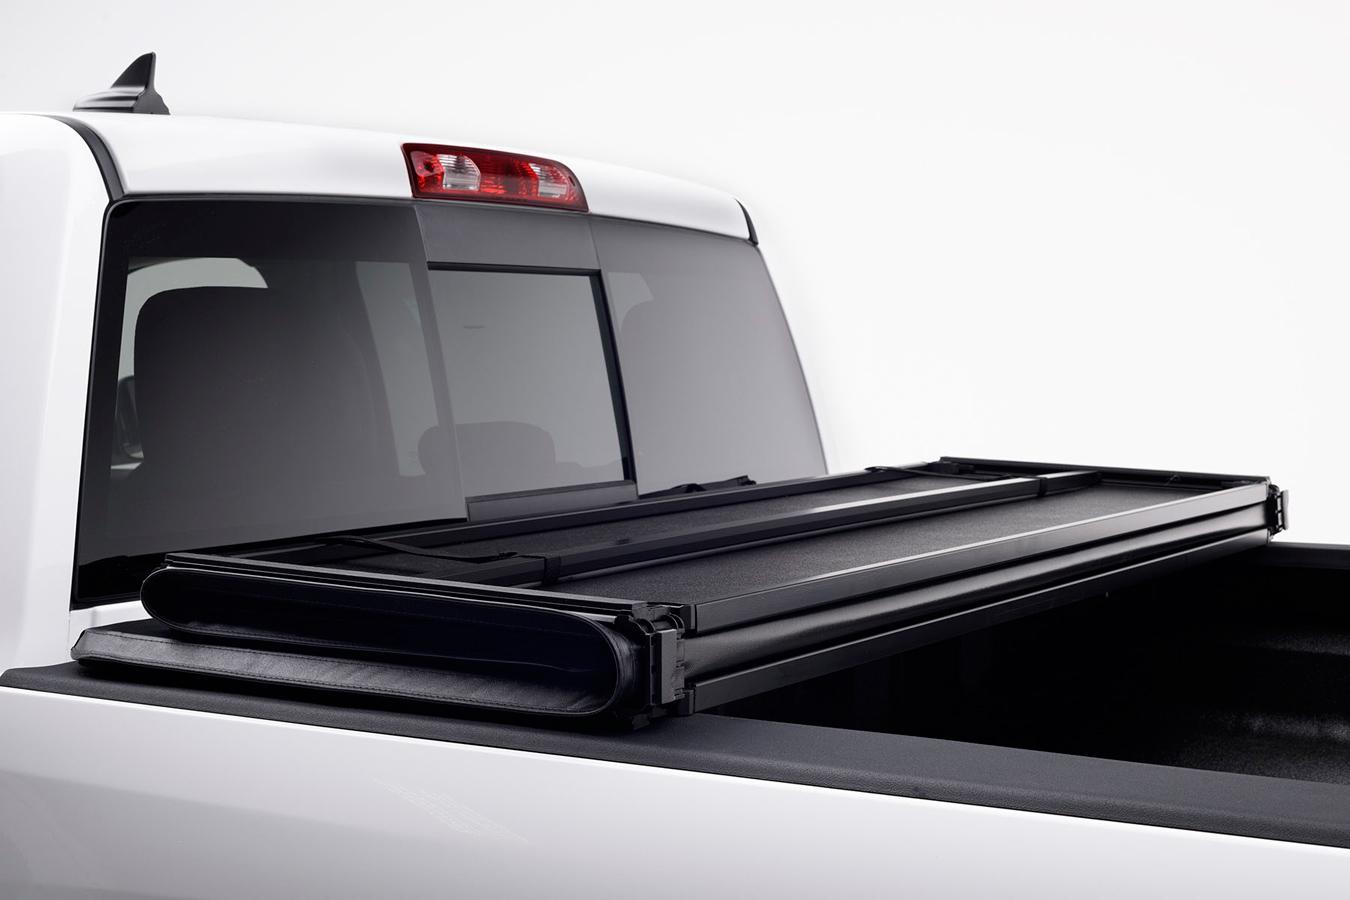 Jeep Wrangler Interior >> American Tonneau Hard Tri-Fold Tonneau Cover - Free Shipping